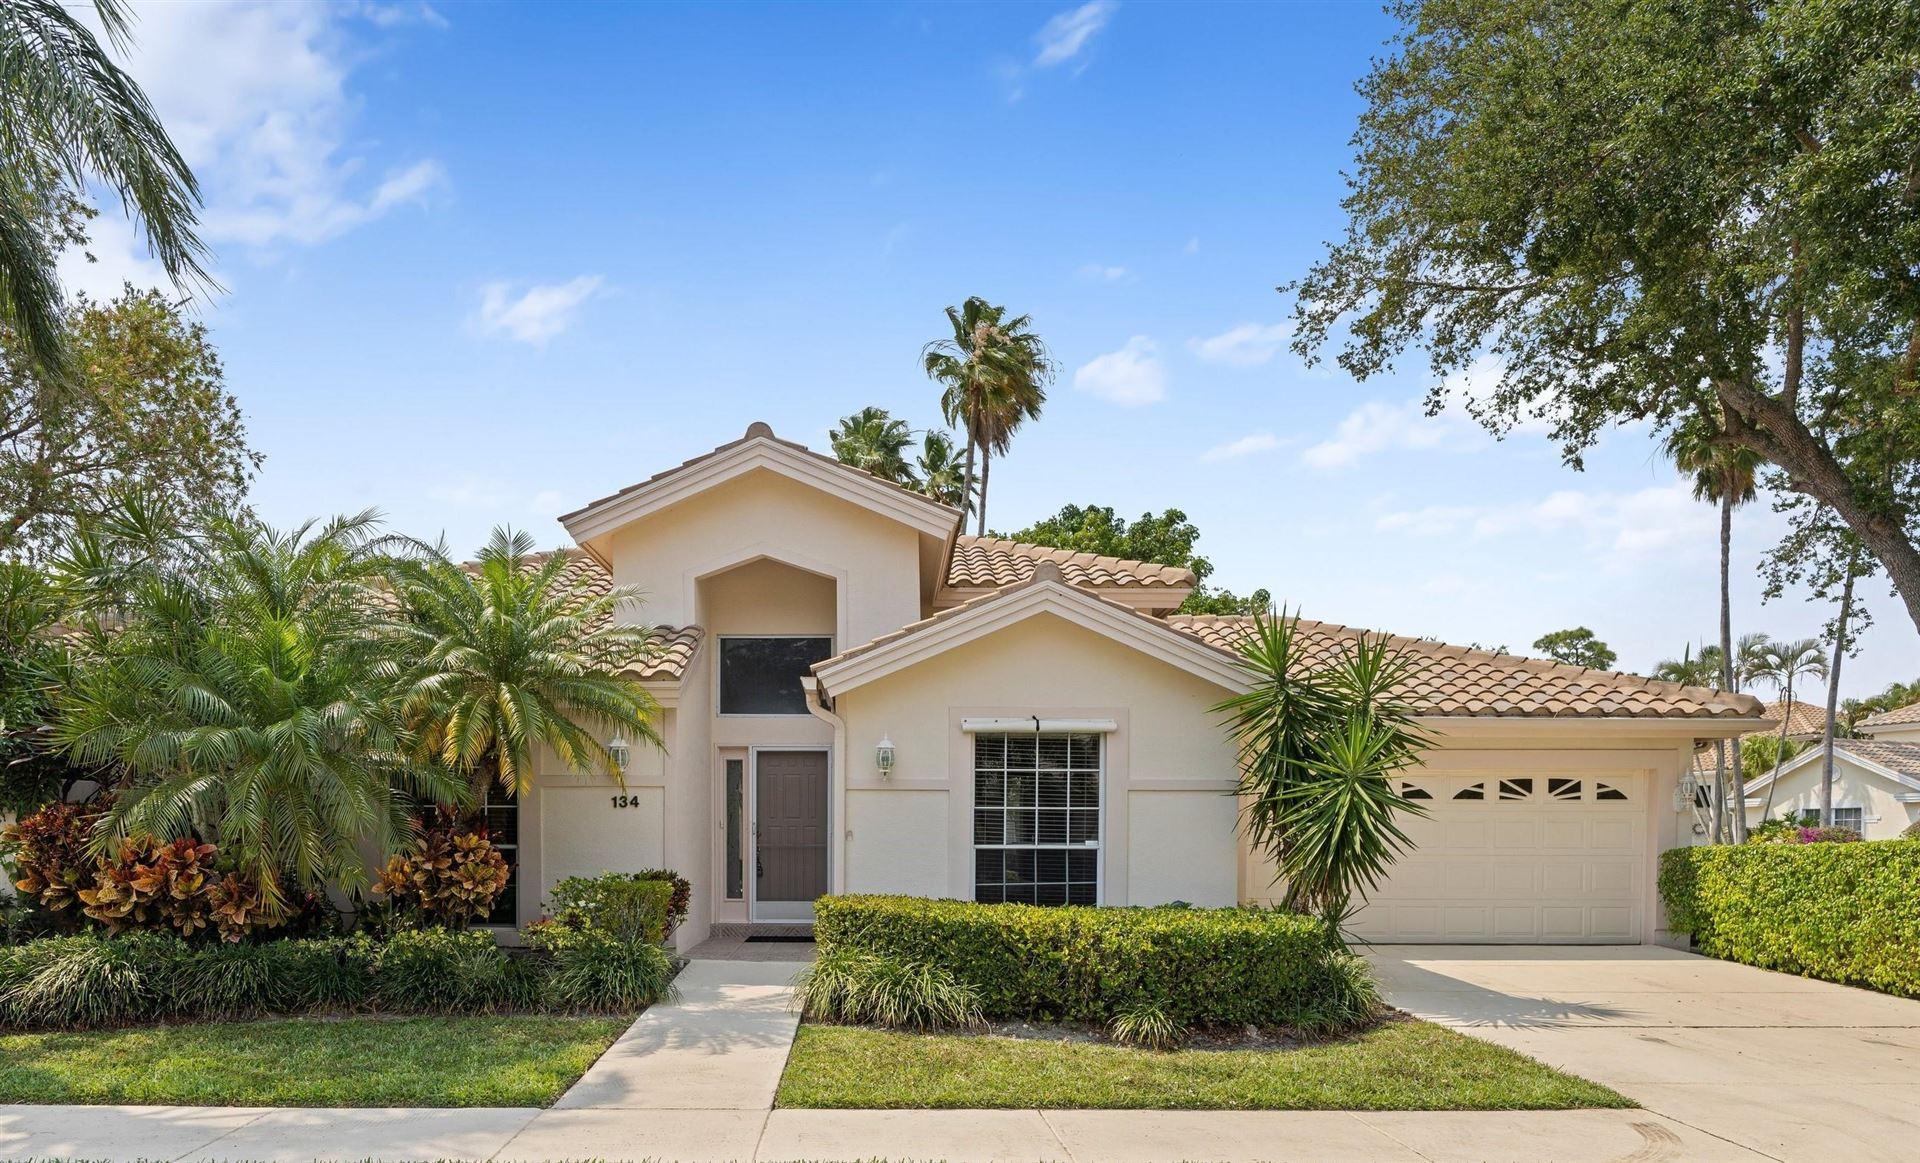 Photo of 134 Eagleton Court, Palm Beach Gardens, FL 33418 (MLS # RX-10709029)